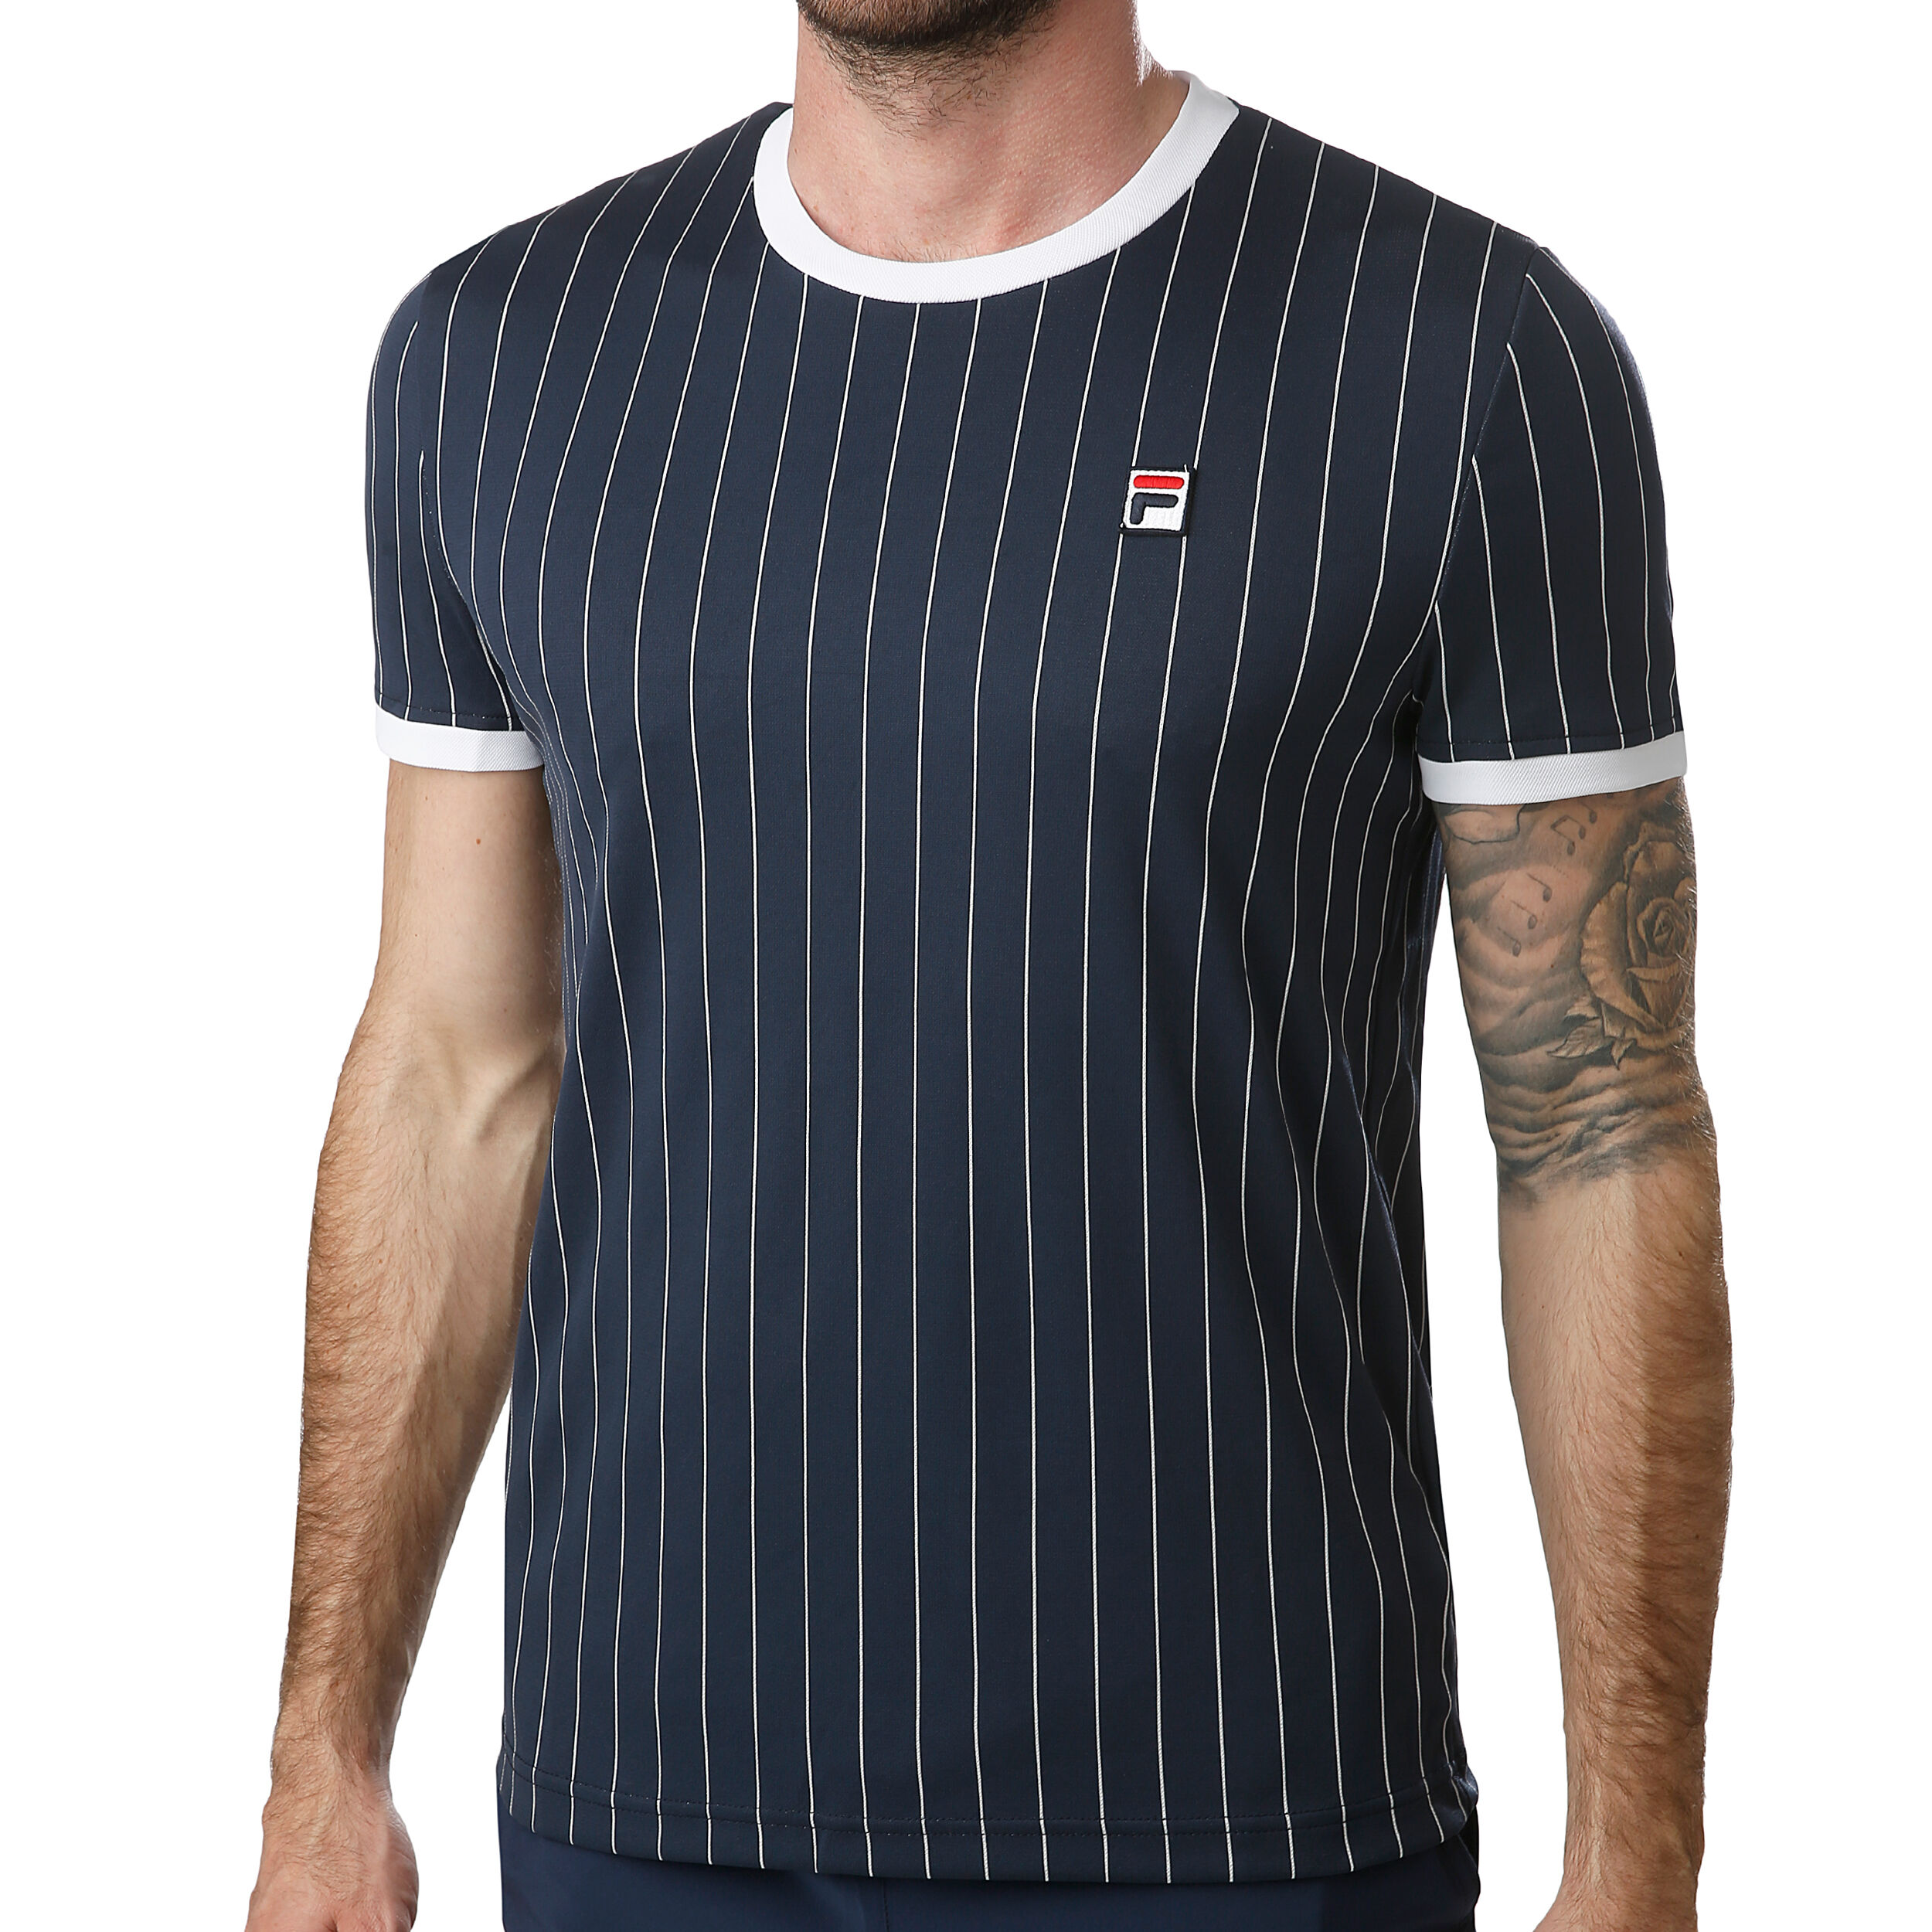 Tee Shirt Fila Stripes Bleu Marine : Achat Tee Shirt de